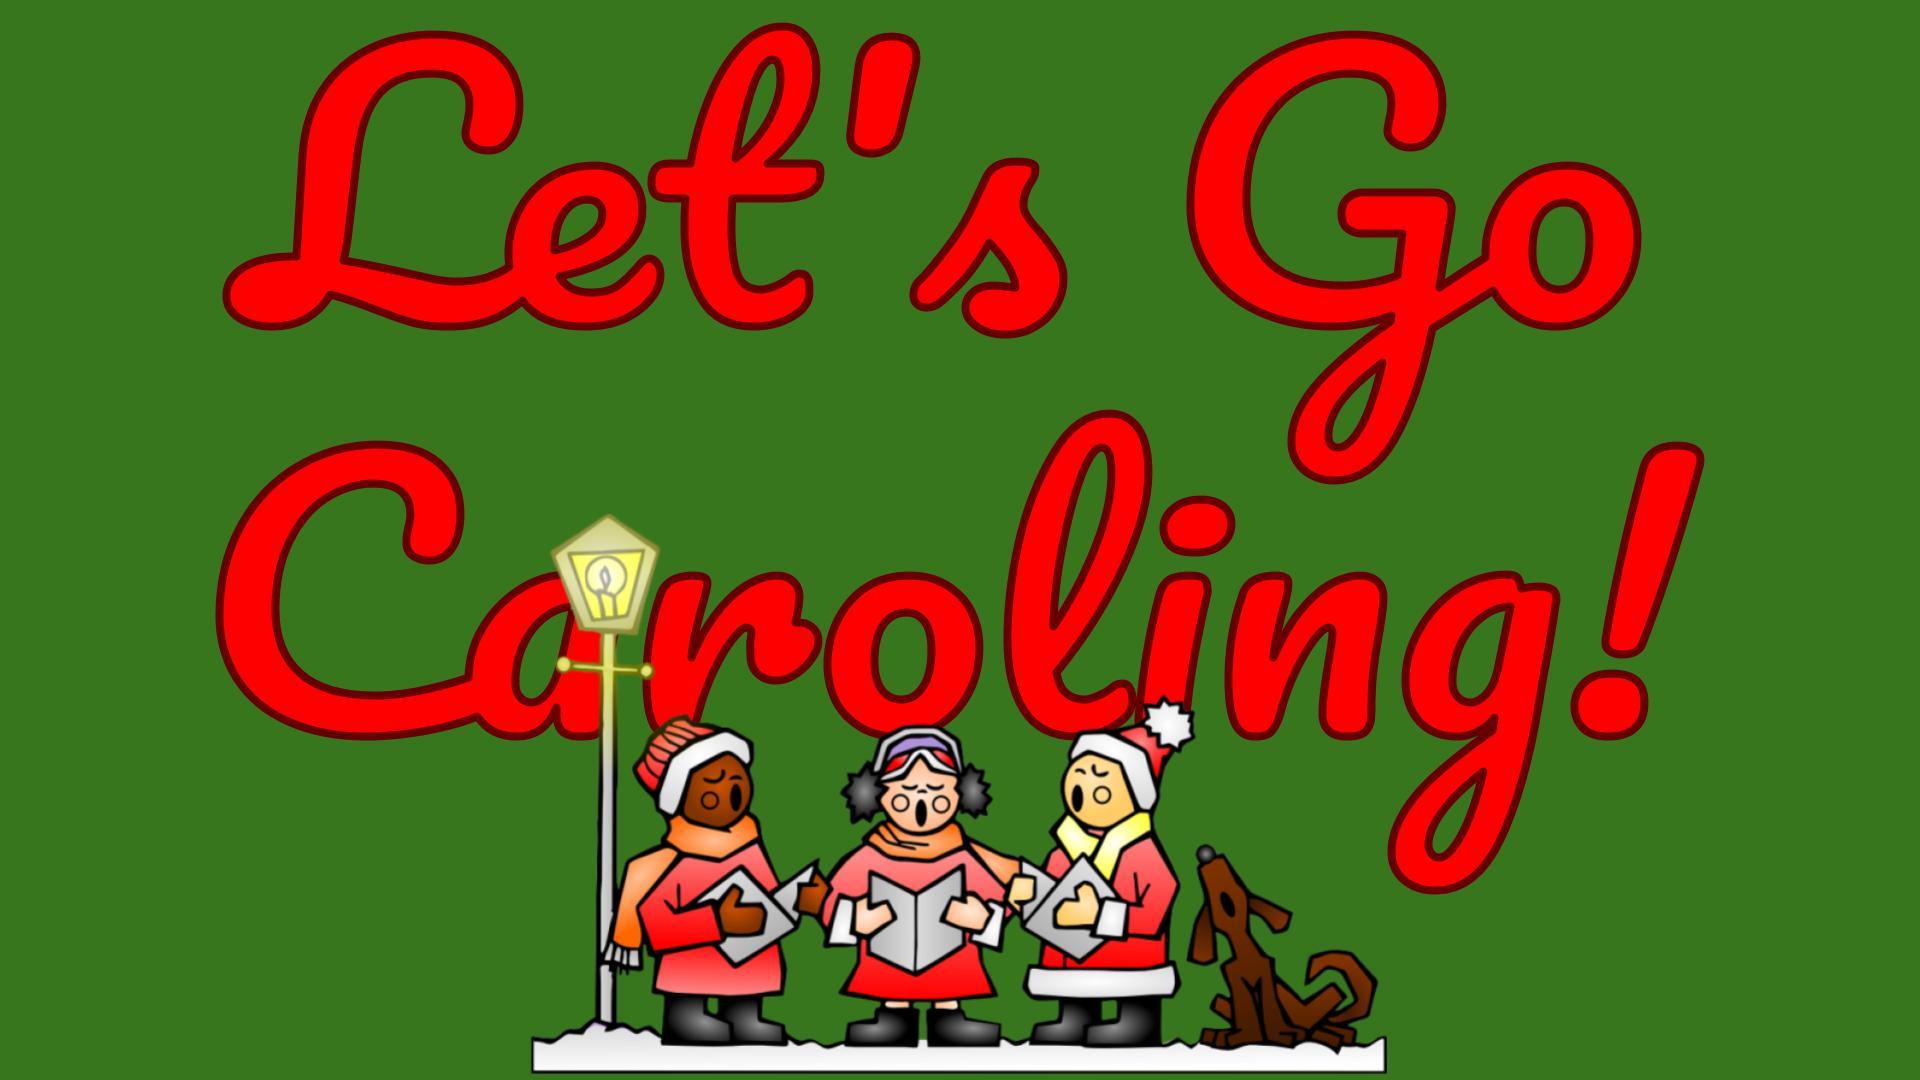 Christmas Caroling Images.Christmas Caroling High Street Baptist Church Canton North Carolina